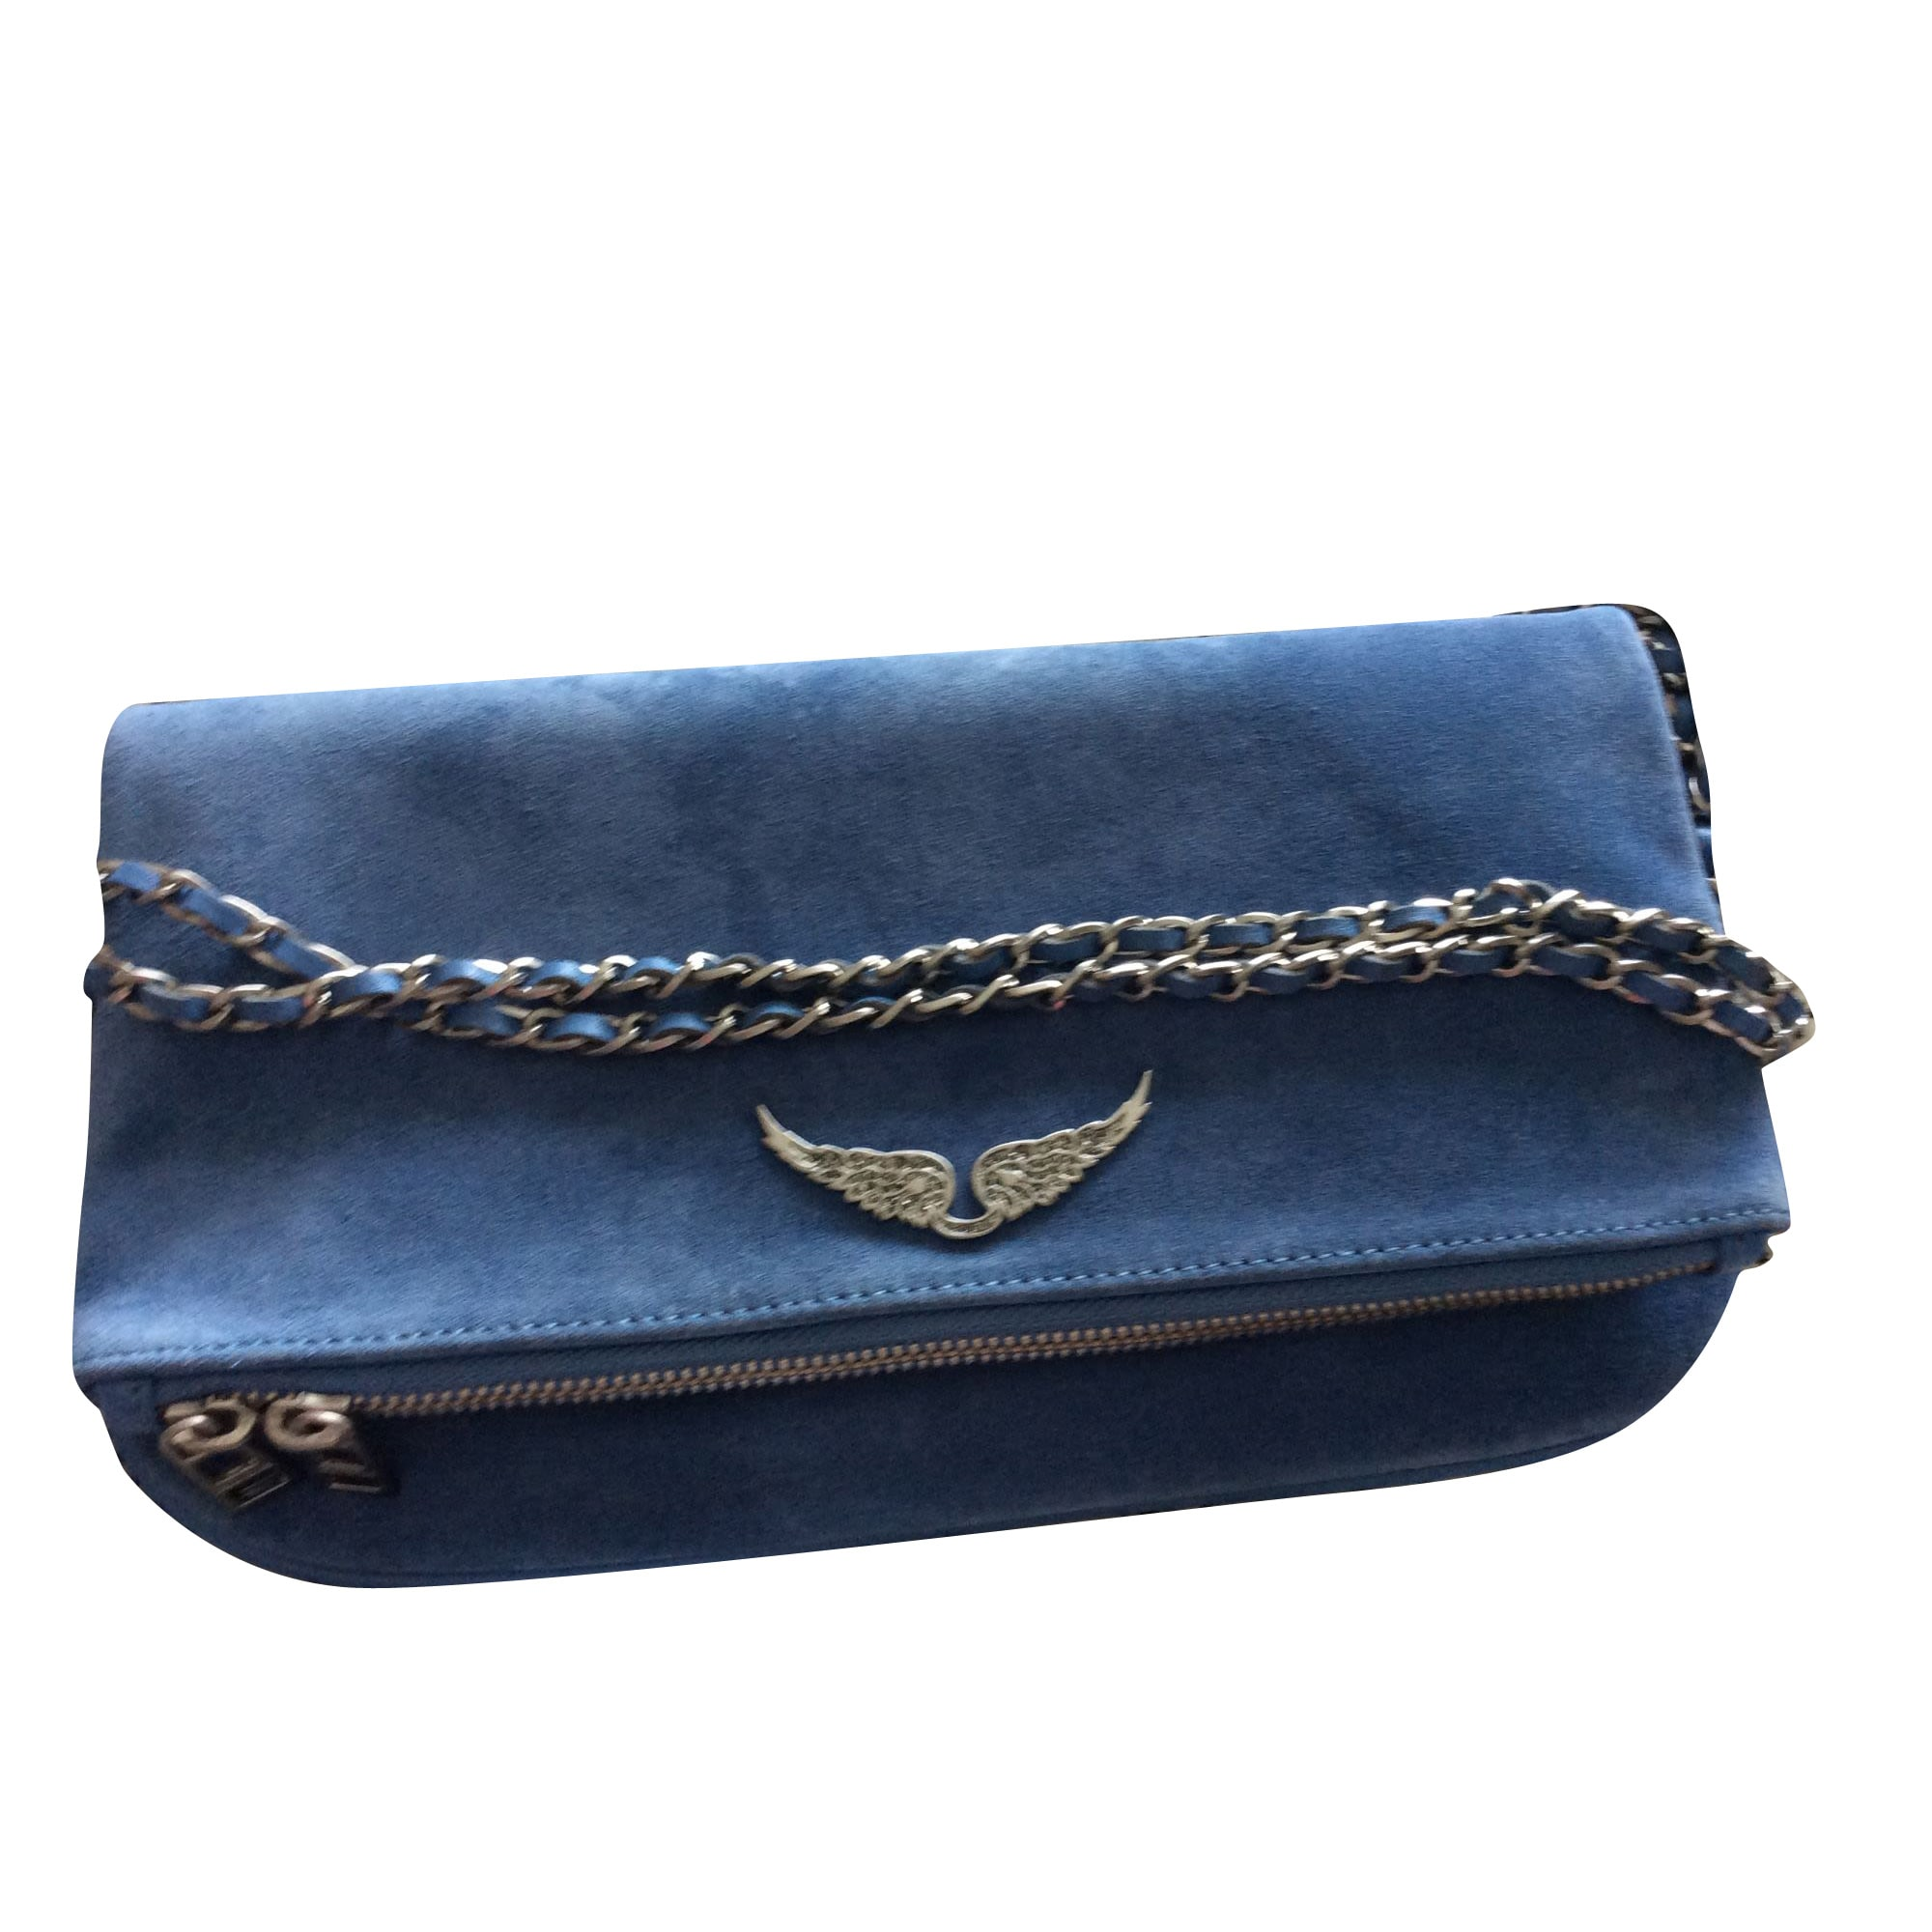 Leather Shoulder Bag ZADIG & VOLTAIRE Blue, navy, turquoise